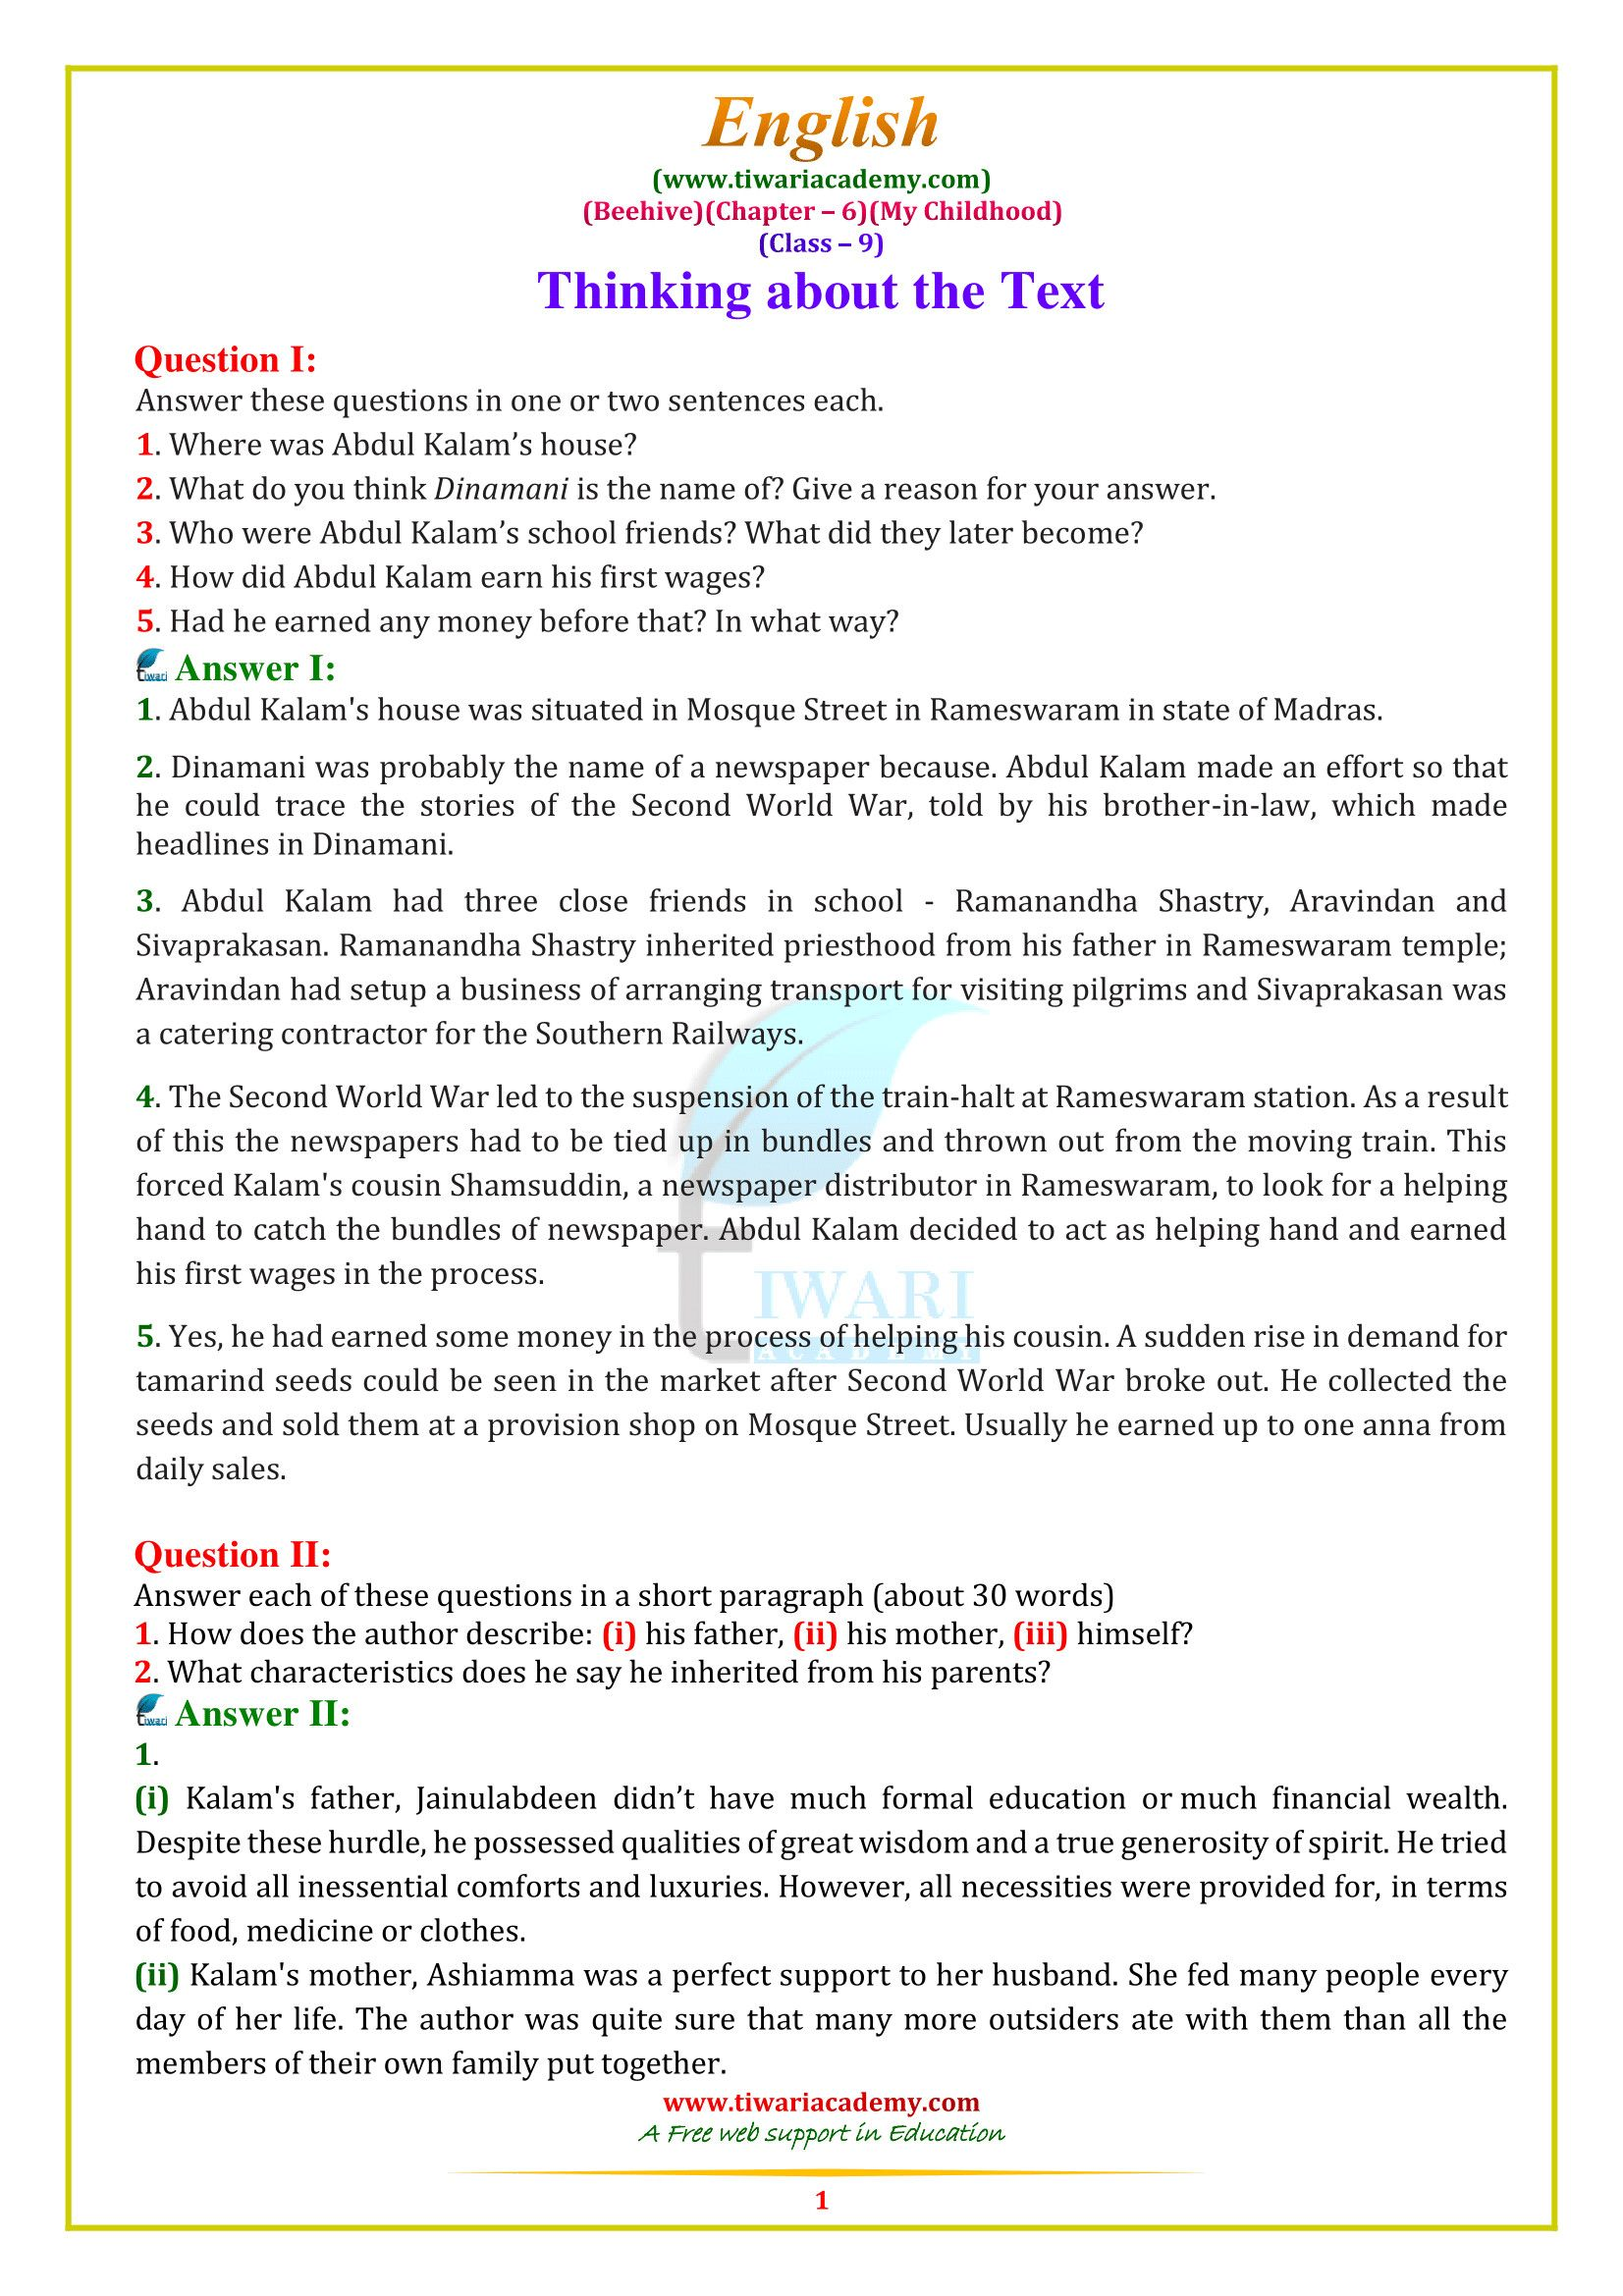 medium resolution of 4 Reading Comprehension Worksheets Sixth Grade 6 9 English NCERT Solutions  BeeH…   Reading comprehension worksheets